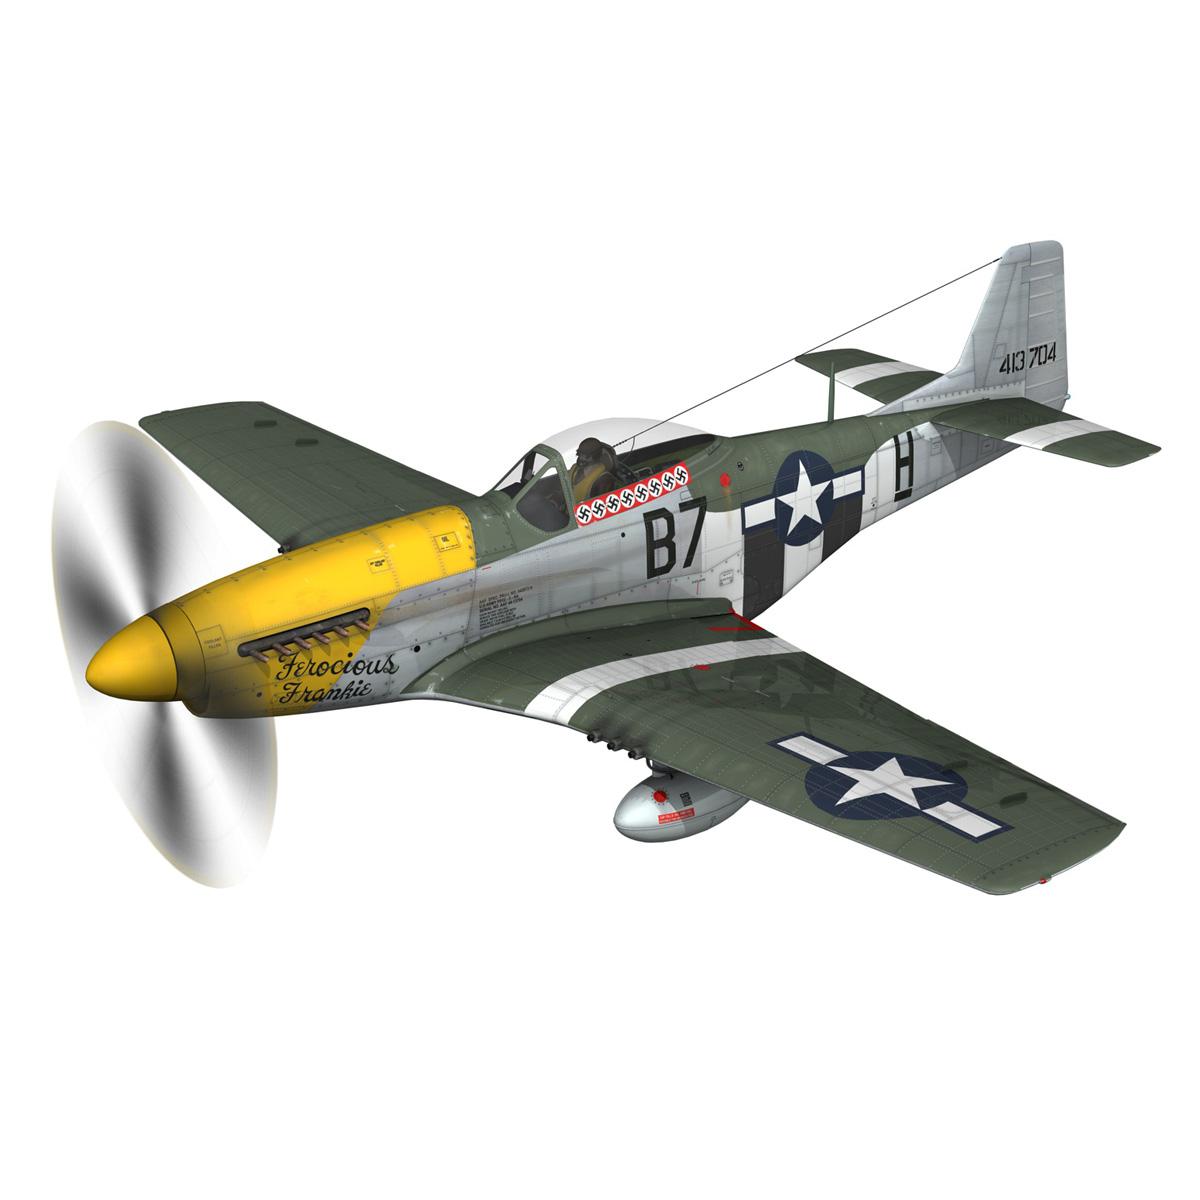 north american p-51d mustang – ferocious frankie 3d model fbx c4d lwo obj 269487